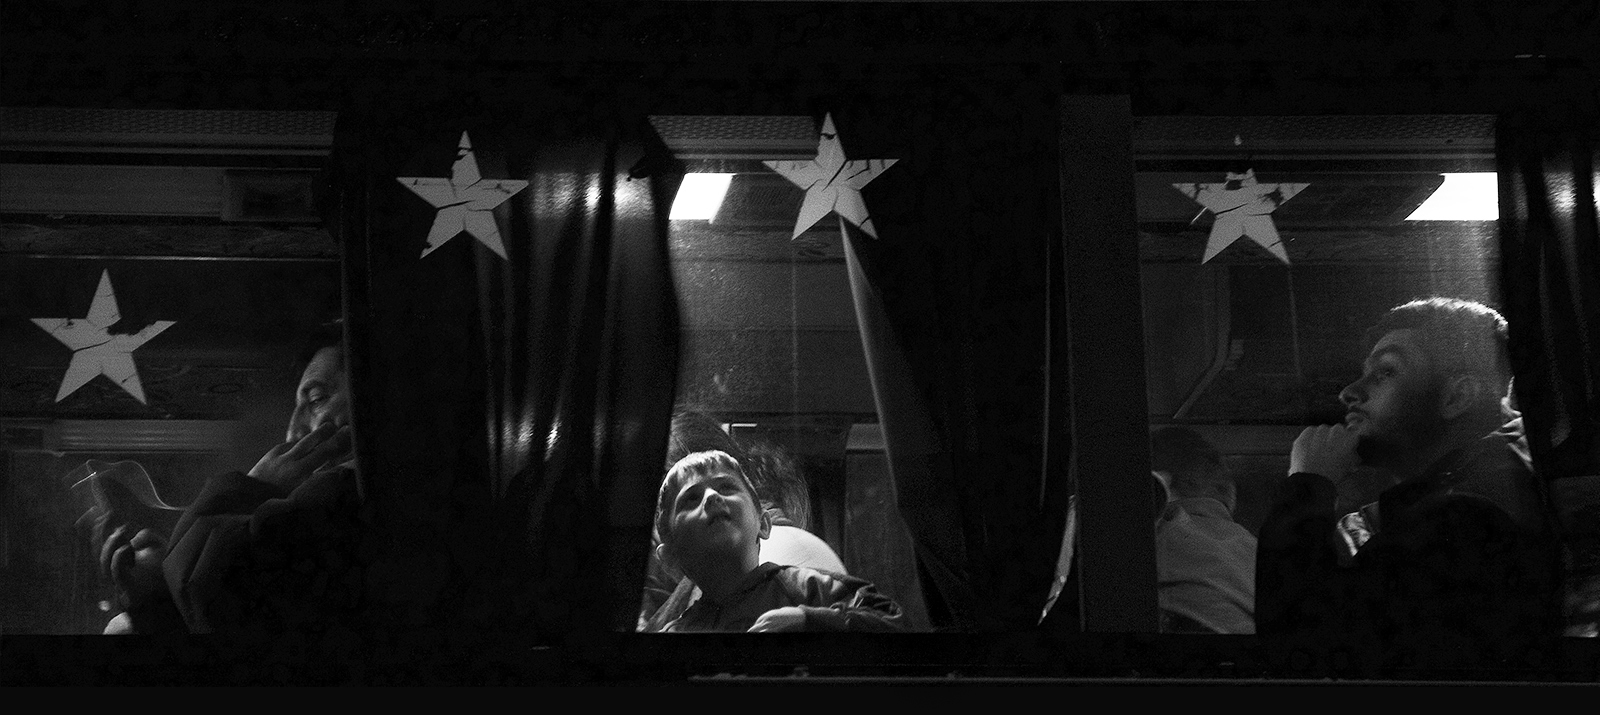 On the Bus © Joanne Teasdale